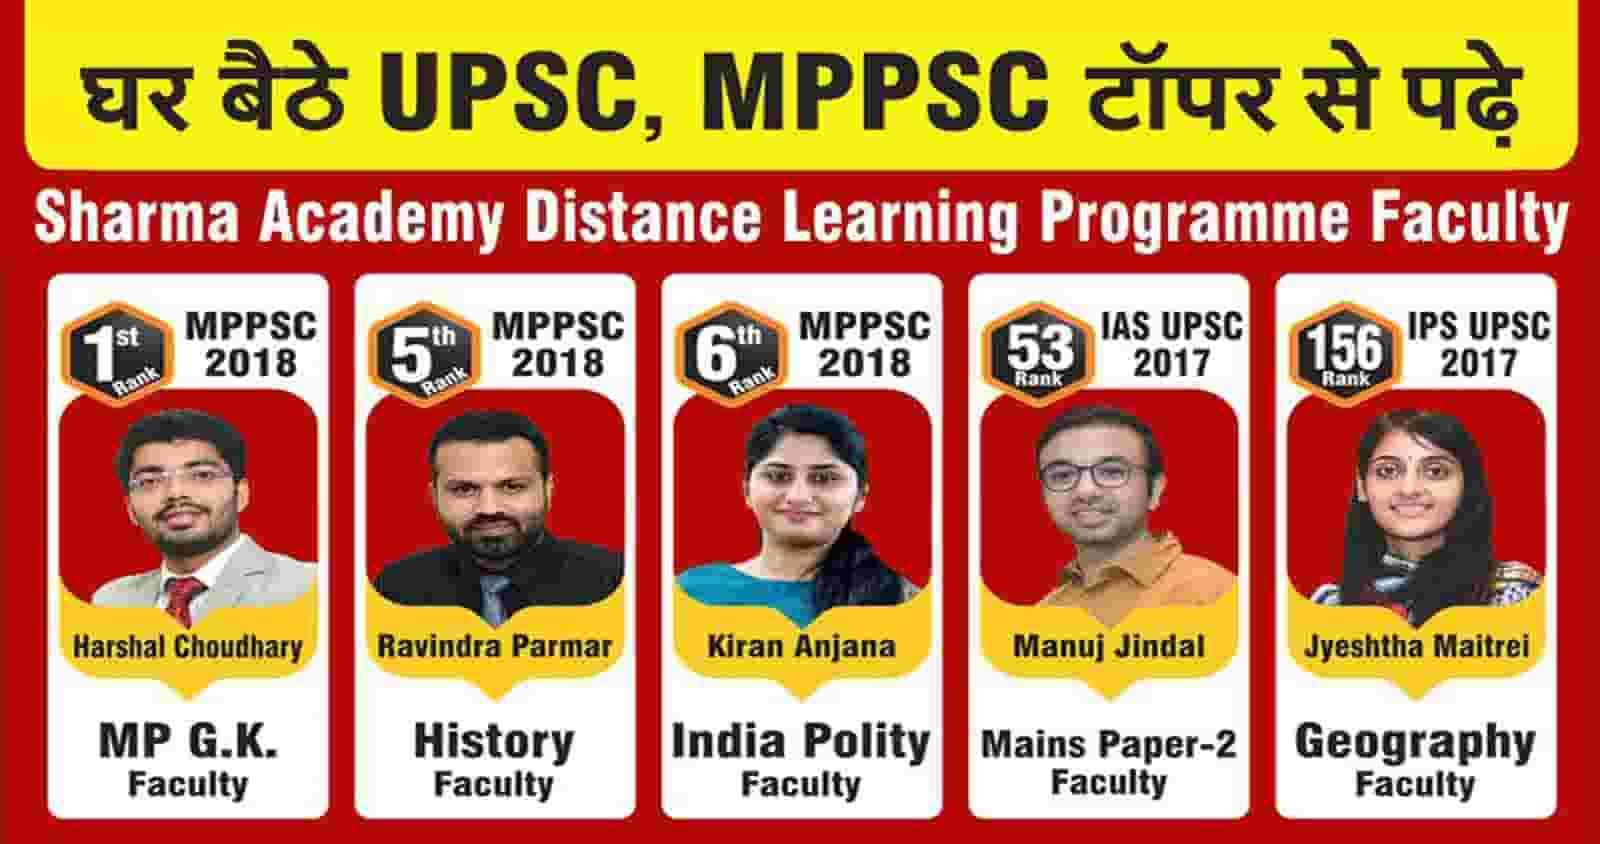 Mppsc Coaching in Indore, Best MPPSC Coaching in Indore, Top MPPSC Coaching in Indore, Sharma Academy Mppsc Coaching in Indore, Sharma Academy Best MPPSC Coaching in Indore, Sharma Academy Top MPPSC Coaching in Indore, Mppsc Coaching in Indore, Best MPPSC Coaching in Indore, Top MPPSC Coaching in Indore, Sharma Academy Mppsc Coaching in Indore, Sharma Academy Best MPPSC Coaching in Indore, Sharma Academy Top MPPSC Coaching in Indore, Mppsc Online Coaching, Mppsc Online Classes, Mppsc Online Coaching, Sharma Academy Mppsc Online Coaching, Sharma Academy Mppsc Online Classes, Sharma Academy Mppsc Online Coaching, Mppsc Coaching in Indore, Best MPPSC Coaching in Indore, Top MPPSC Coaching in Indore, Sharma Academy Mppsc Coaching in Indore, Sharma Academy Best MPPSC Coaching in Indore, Sharma Academy Top MPPSC Coaching in Indore